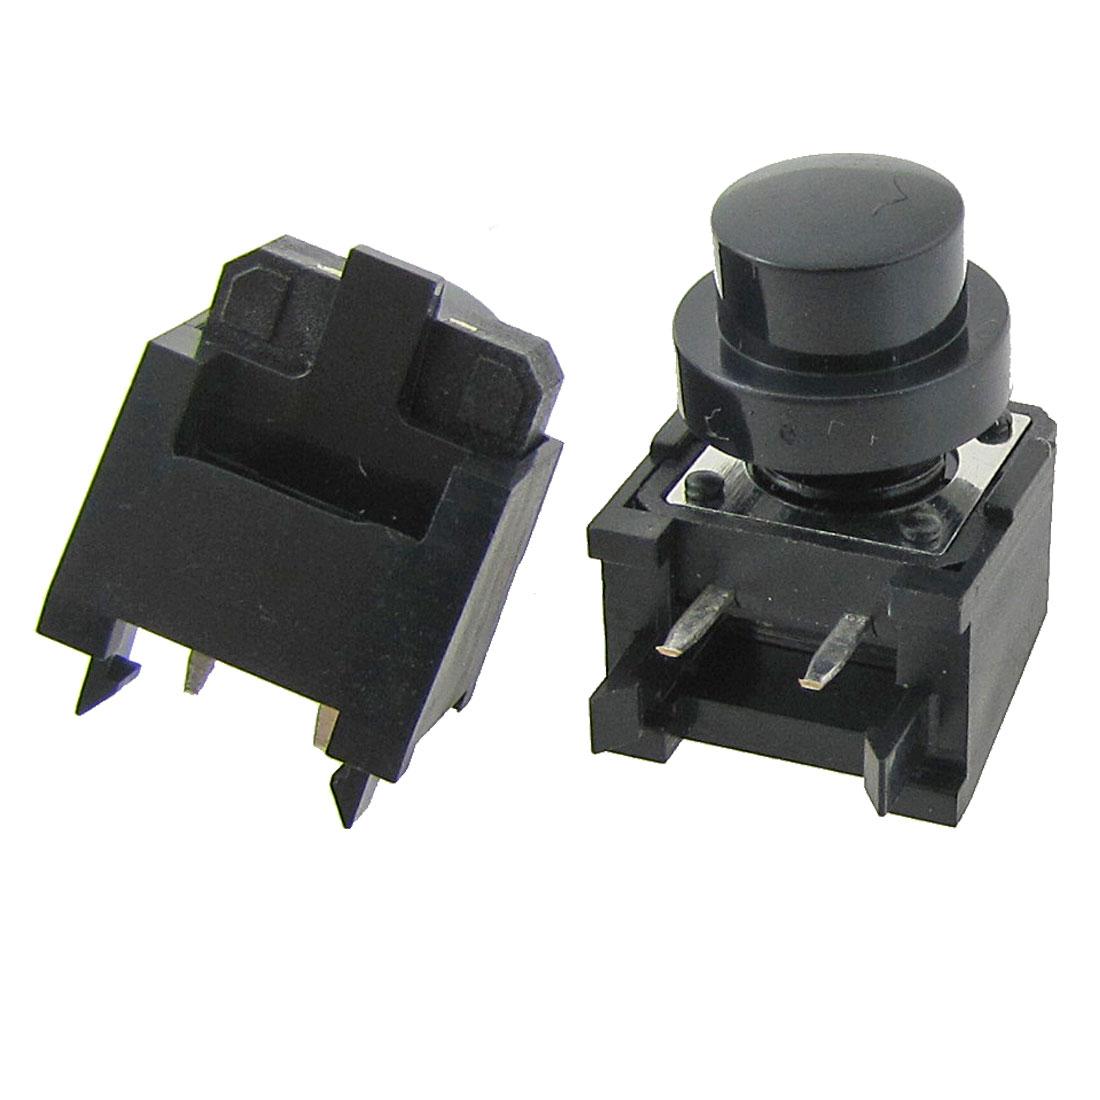 2 Pcs Momentary Tact Push Button Switch Right Angle 2 Pin 12 x 12 x 12mm + Cap